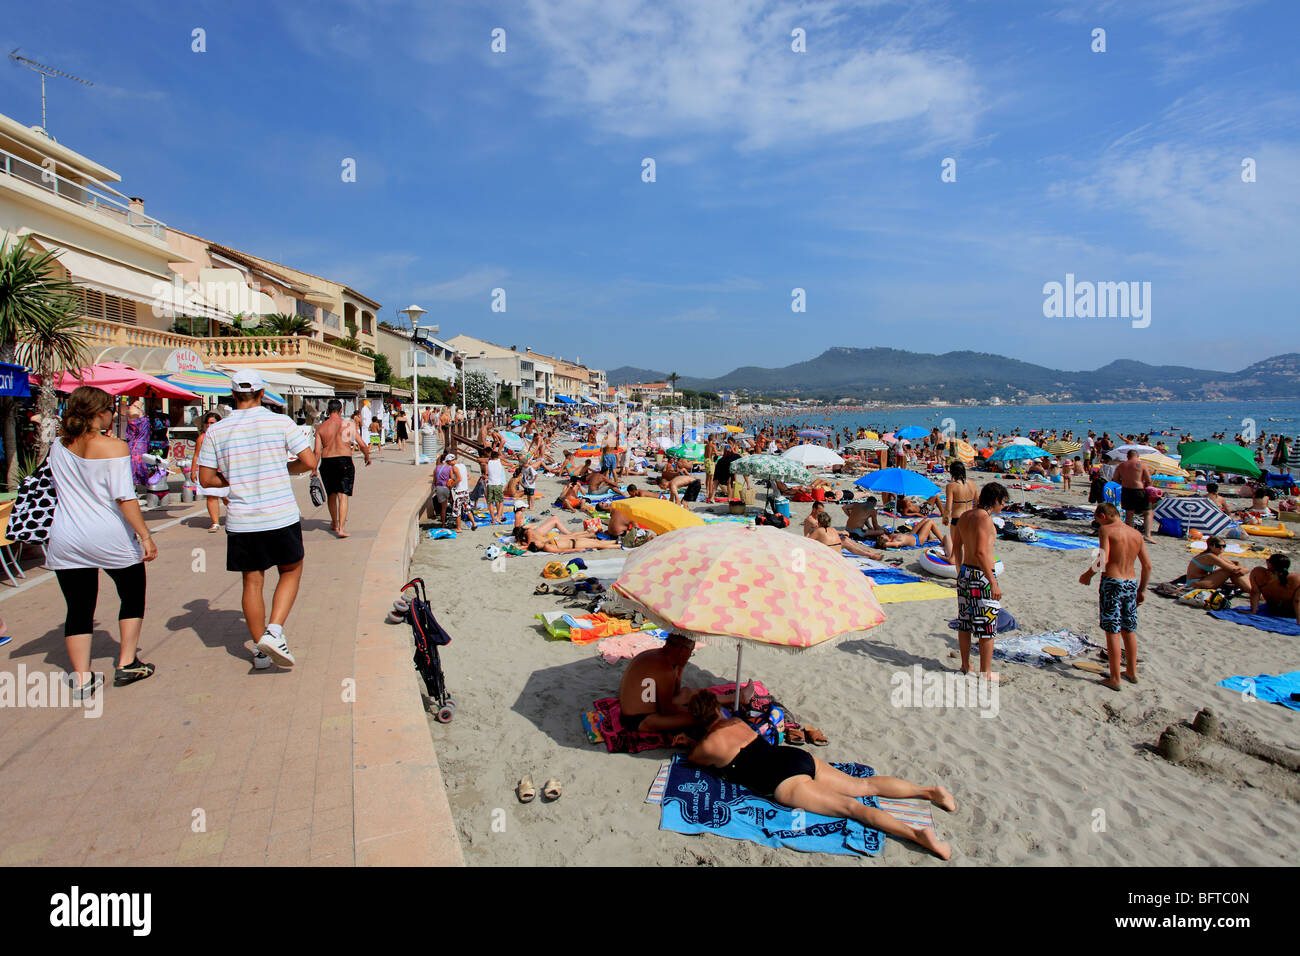 The beach of saint cyr sur mer near bandol stock photo royalty free image 26966485 alamy - Office tourisme st cyr sur mer ...